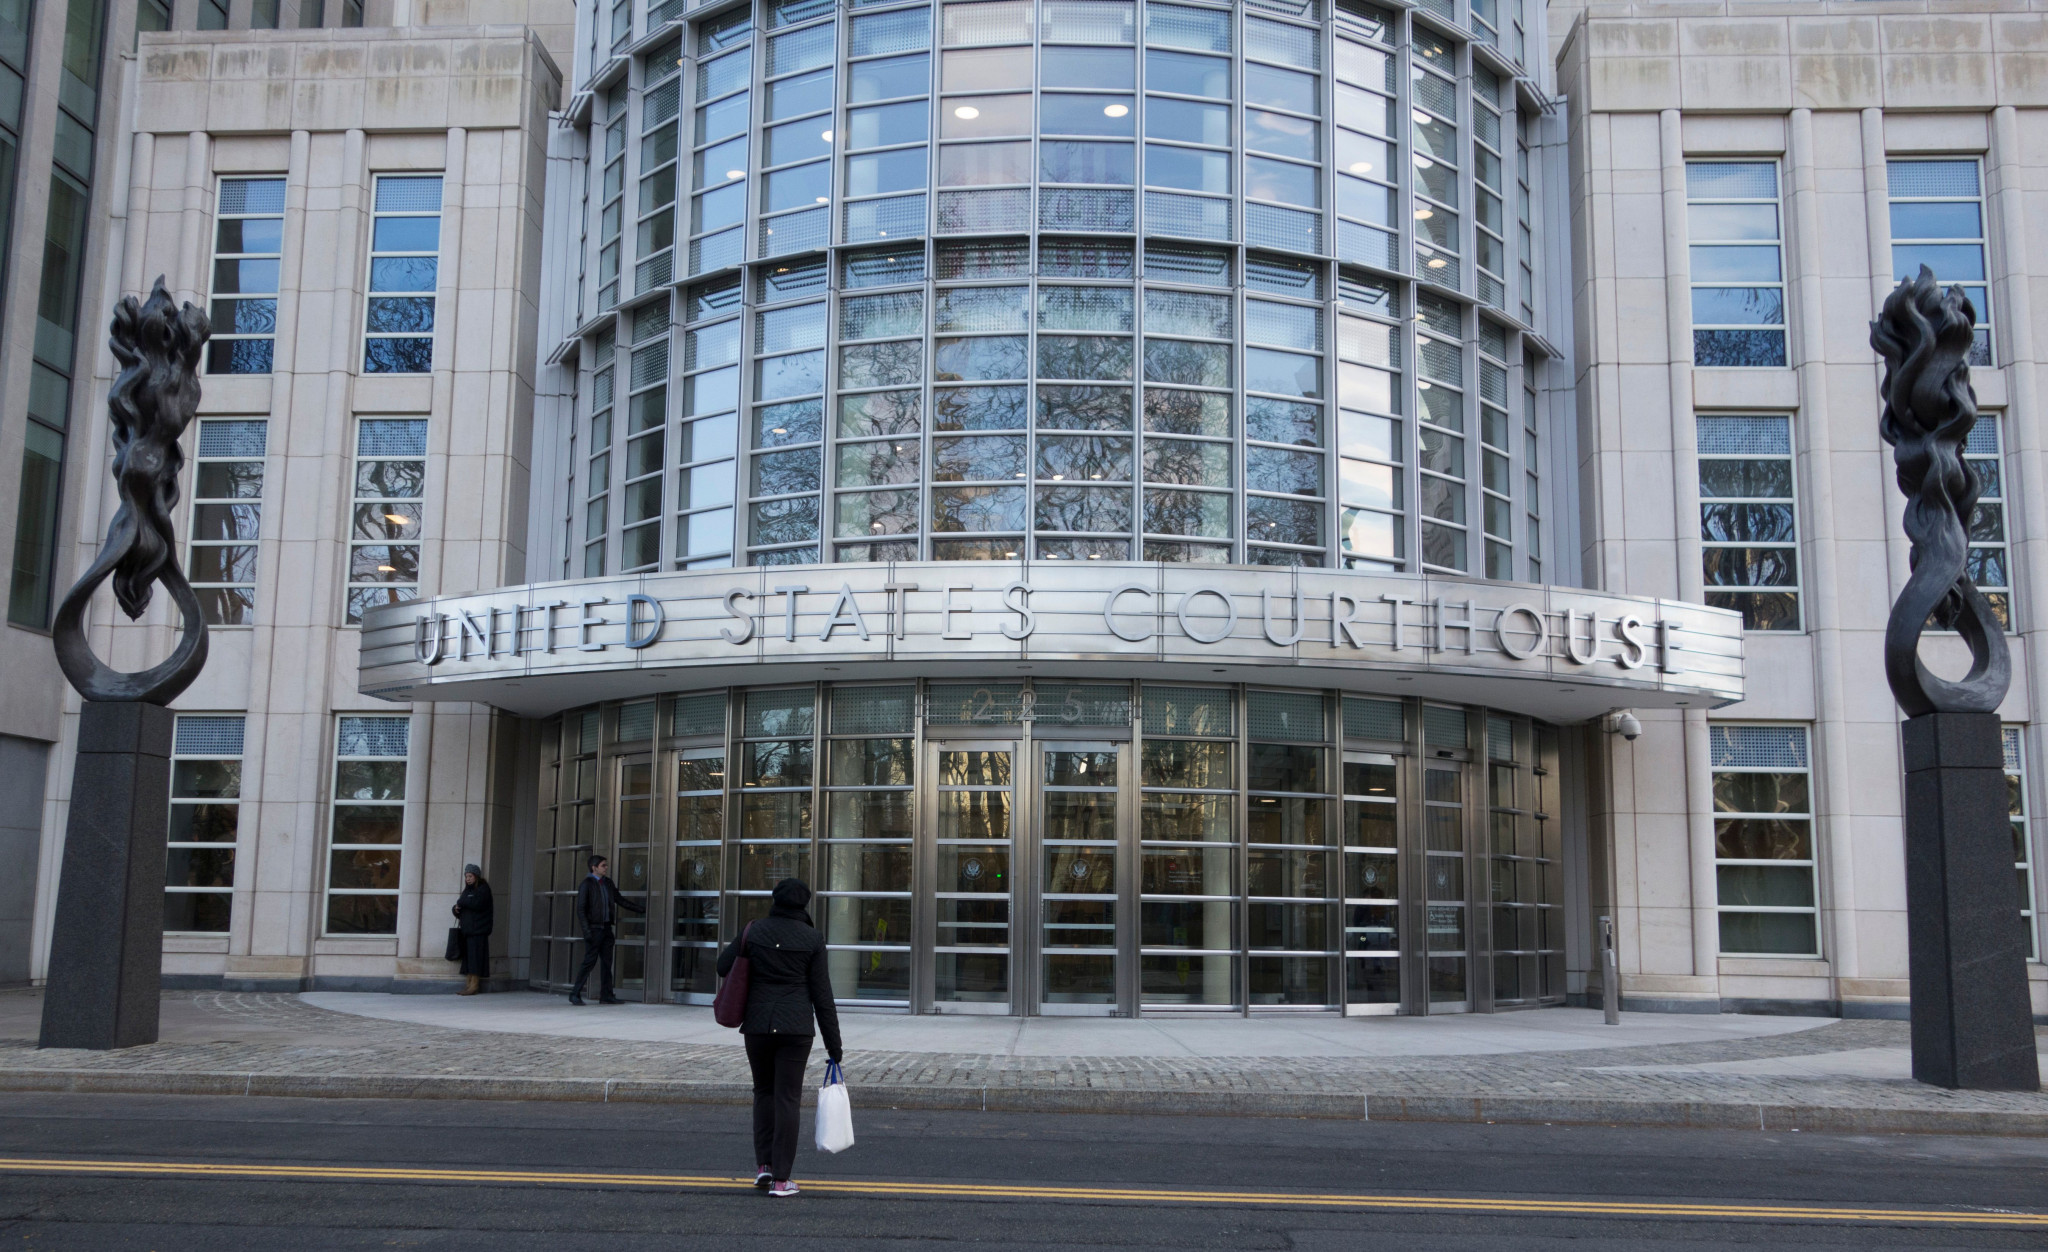 Judge dismisses FIFA request for compensation following corruption scandal